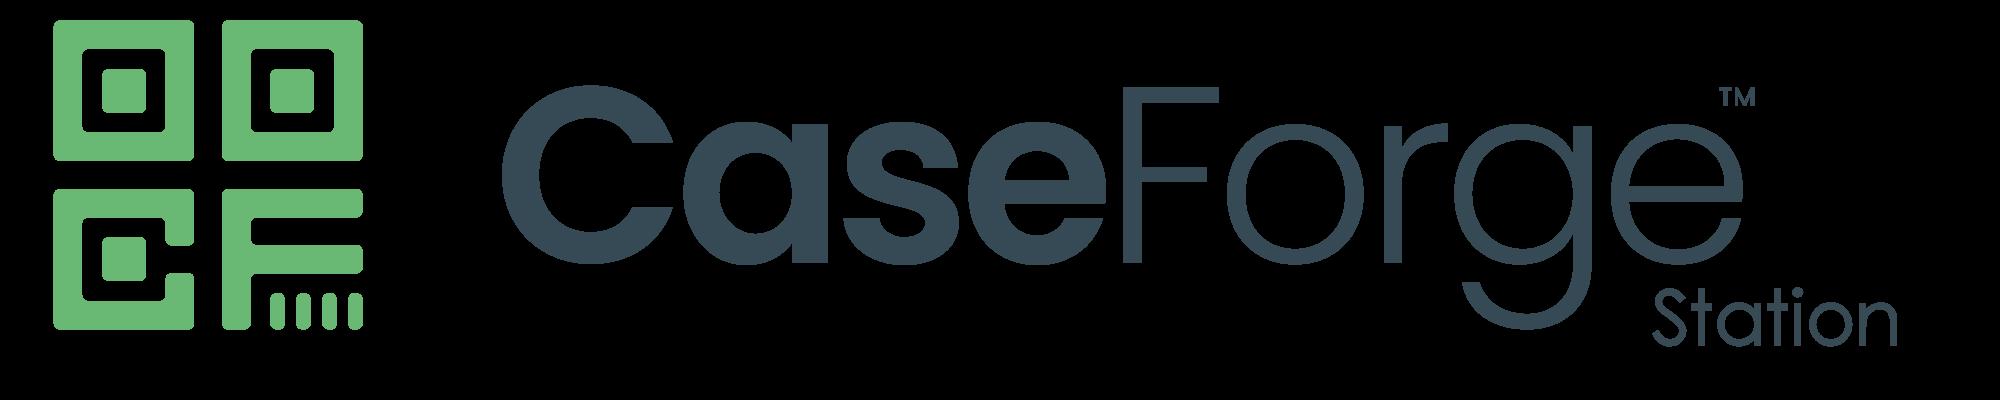 CaseForge Station